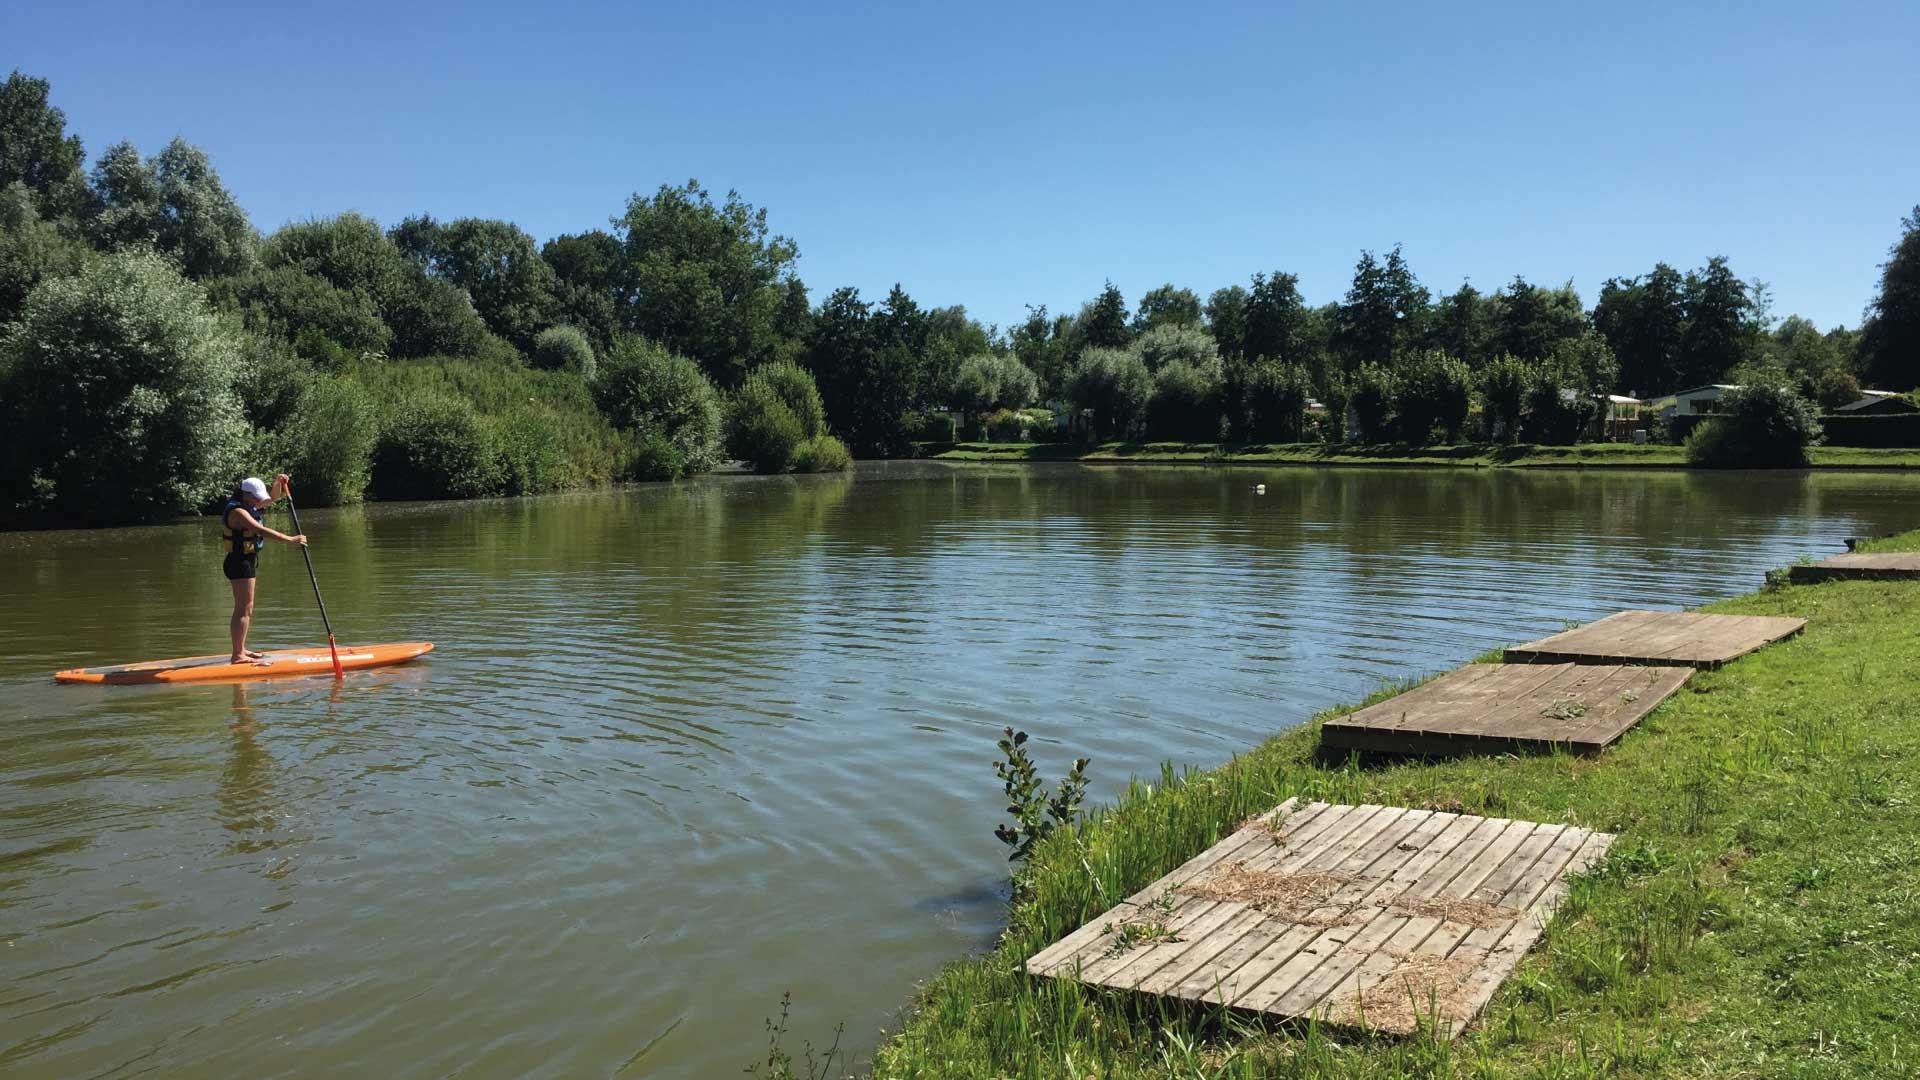 Paddle sur étang - Camping du Molinel - Tortefontaine